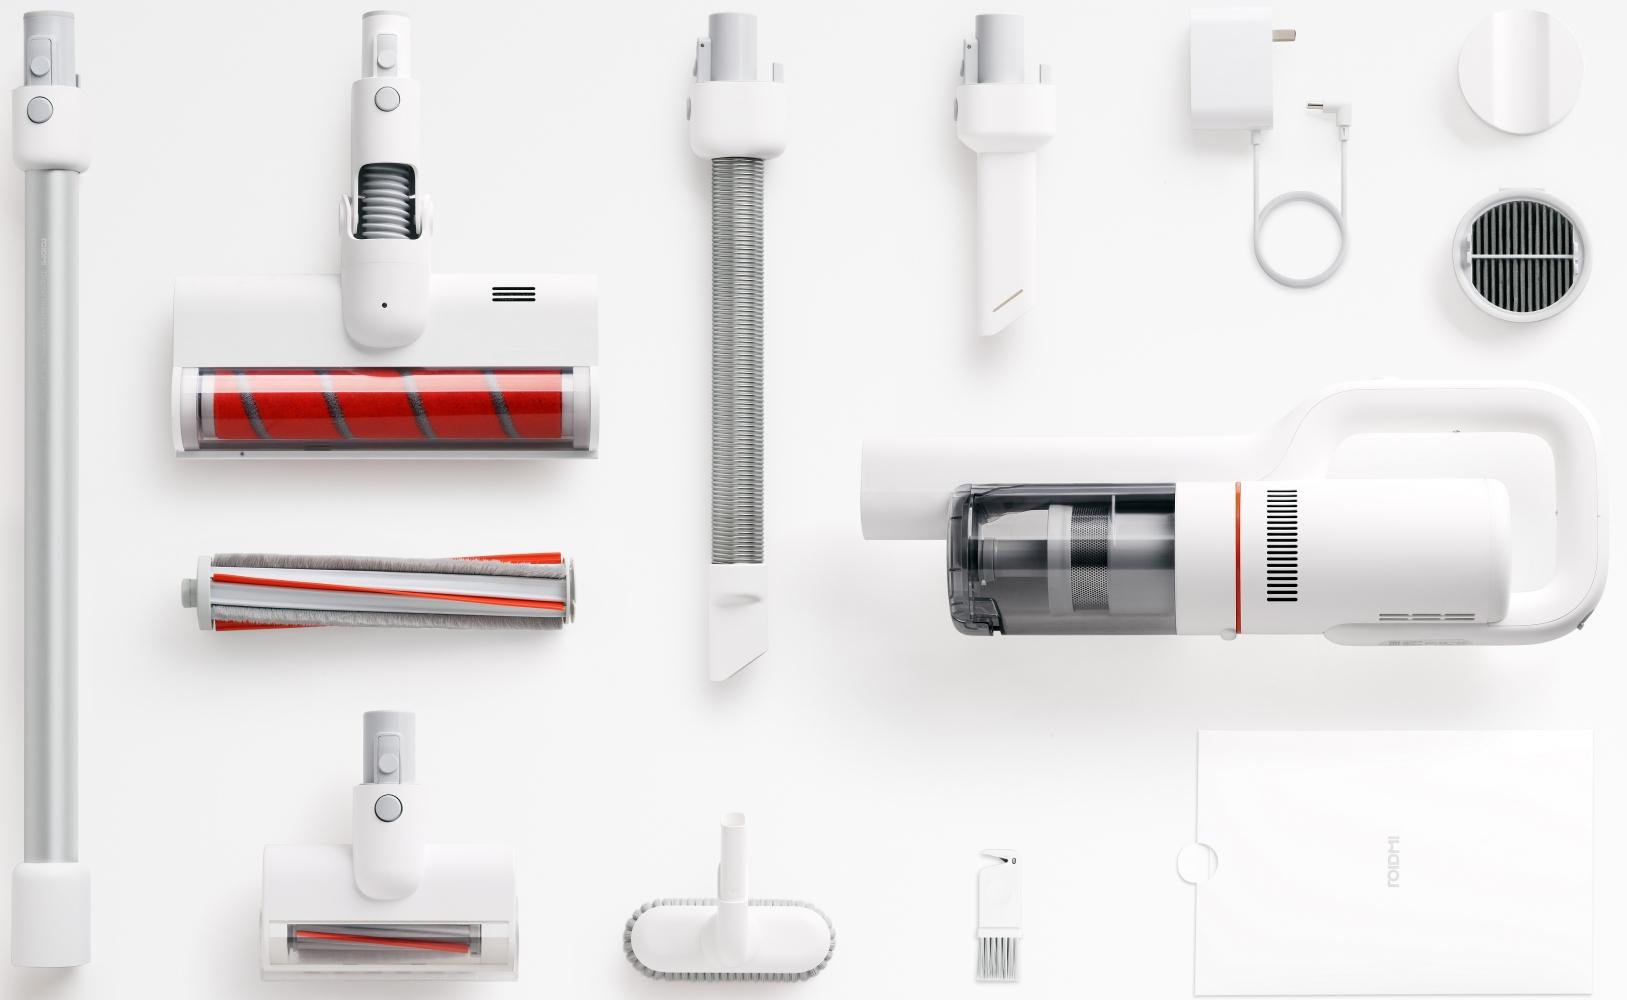 Xiaomi Roidmi F8 Handheld Wireless Vacuum Cleaner 2 Komplekt